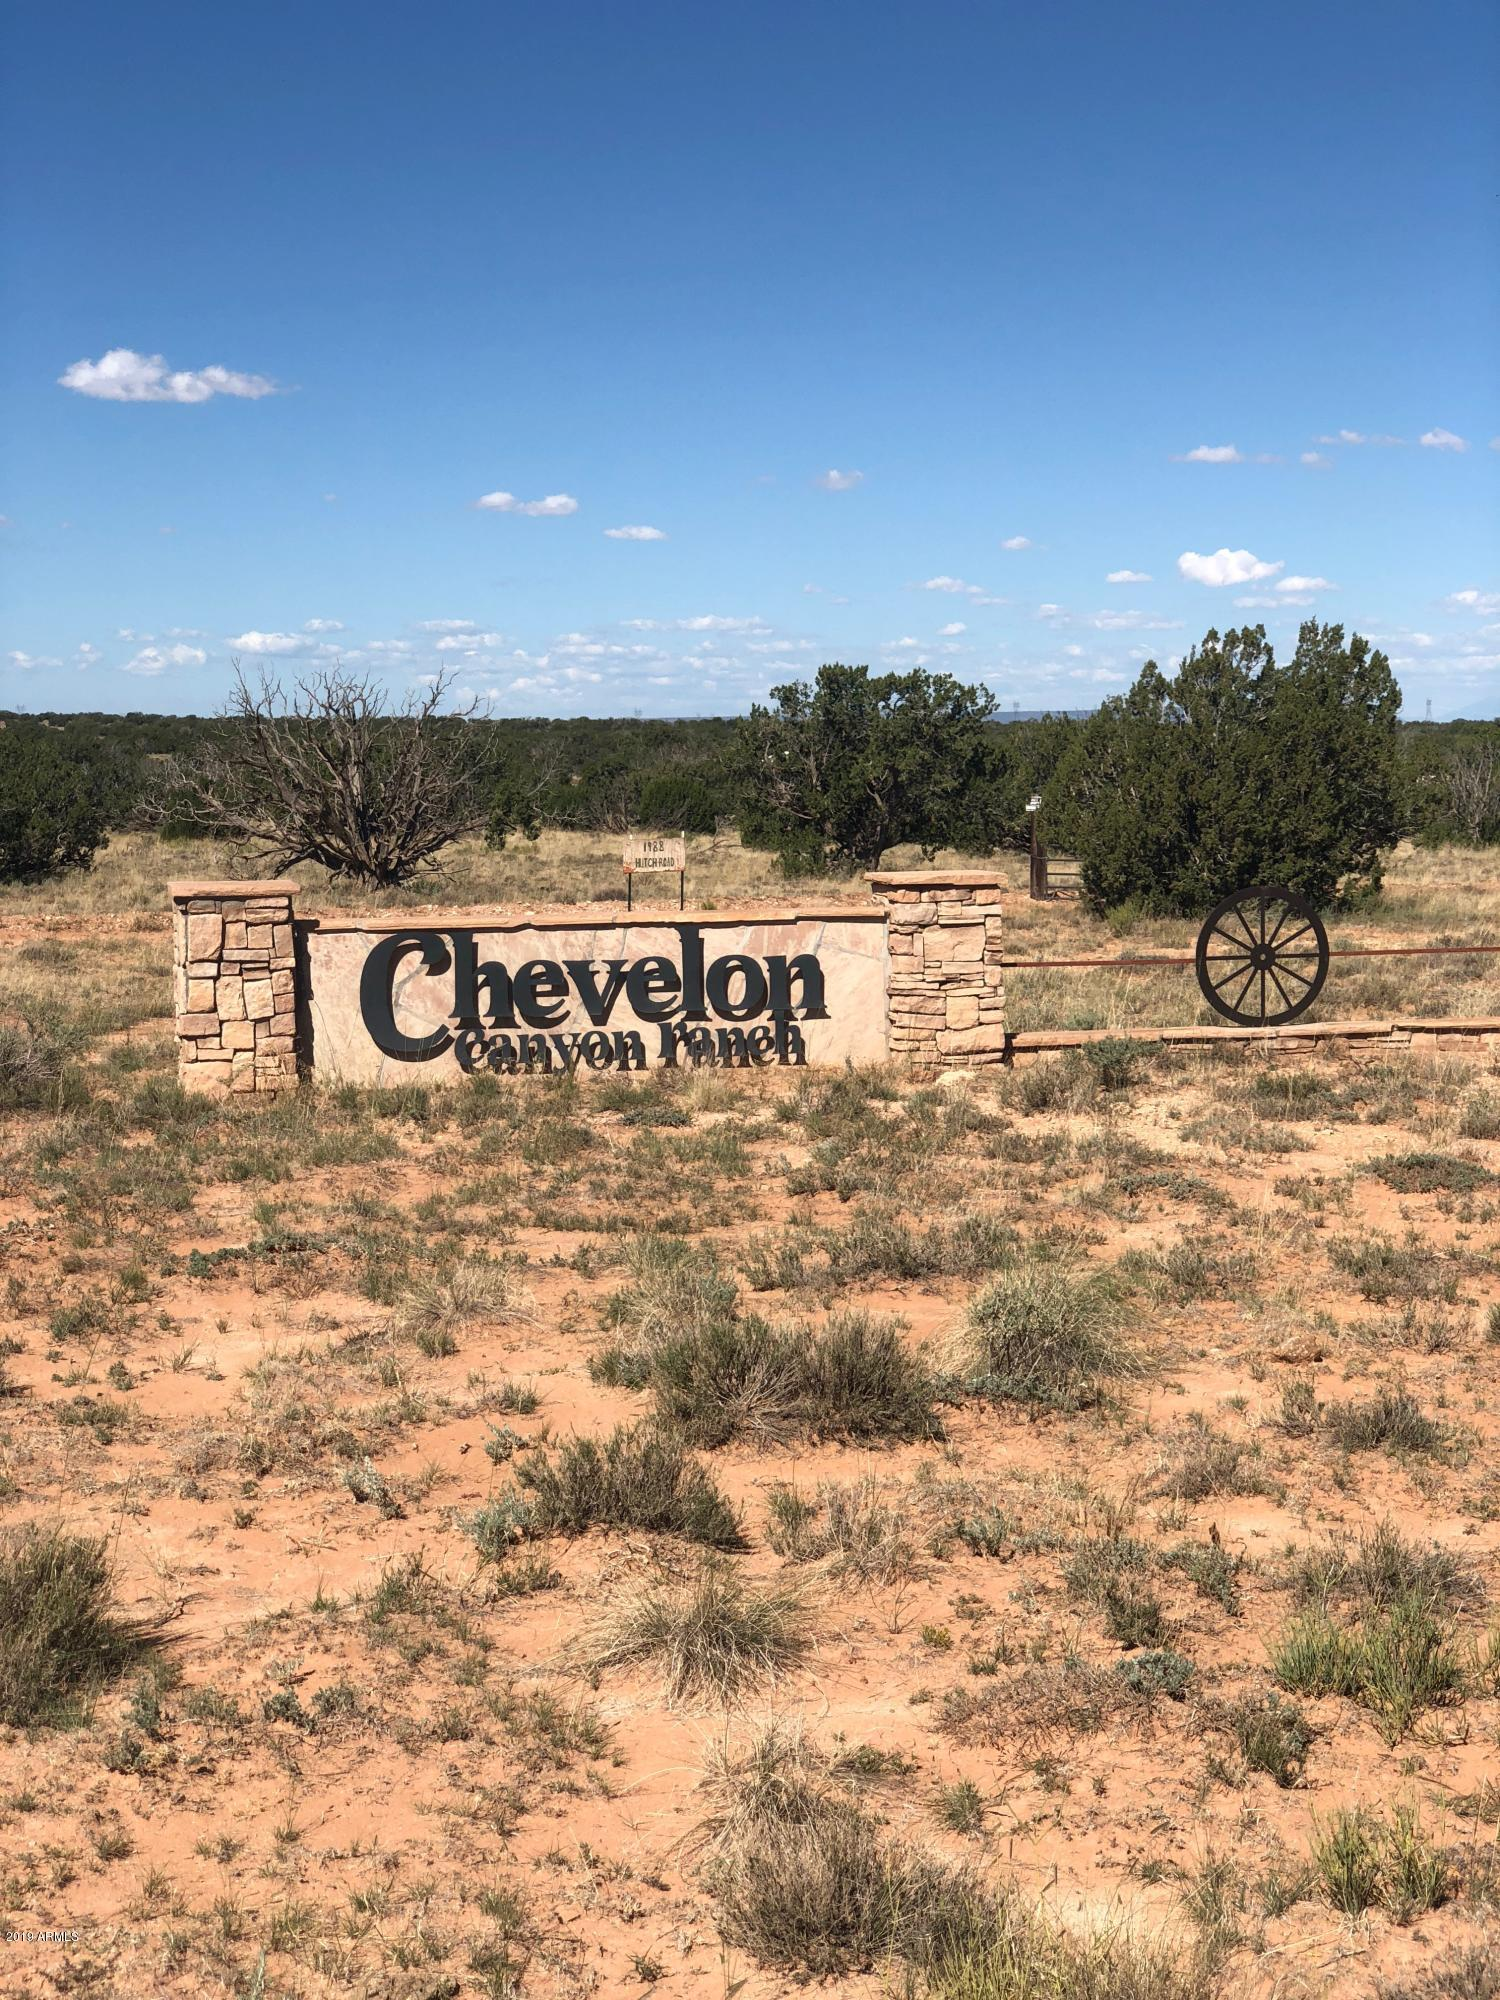 6009 RIVER RUN Drive # 373, Winslow, AZ 86047, ,Land,For Sale,6009 RIVER RUN Drive # 373,5955957